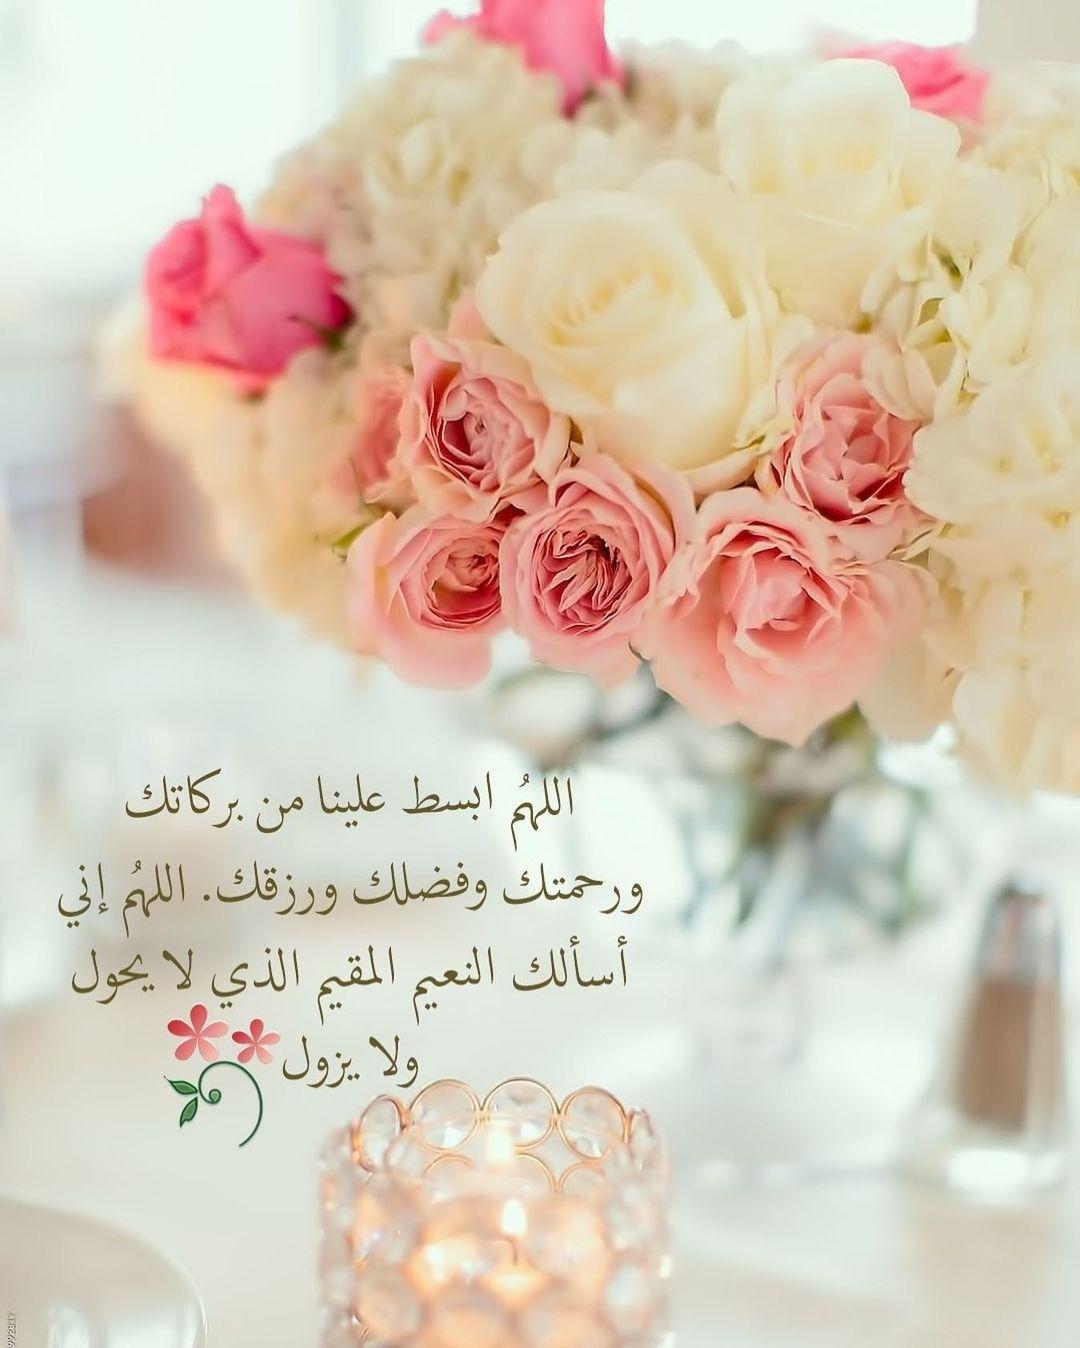 Pin By عبق الورد On أدعيه وأذكار Islamic Images Holy Quran Islamic Prayer